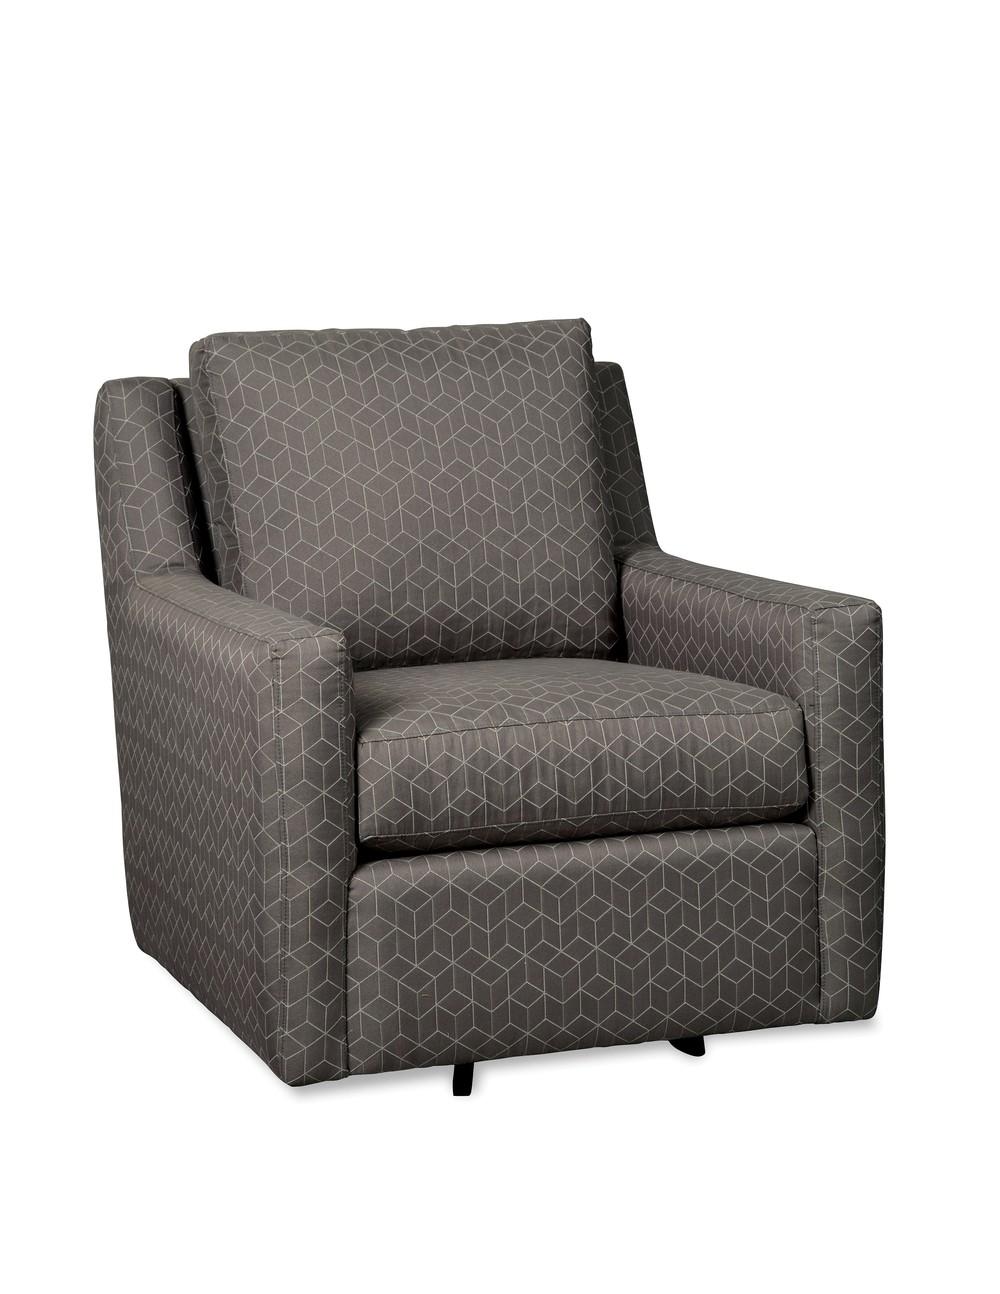 Craftmaster Furniture - Swivel Chair